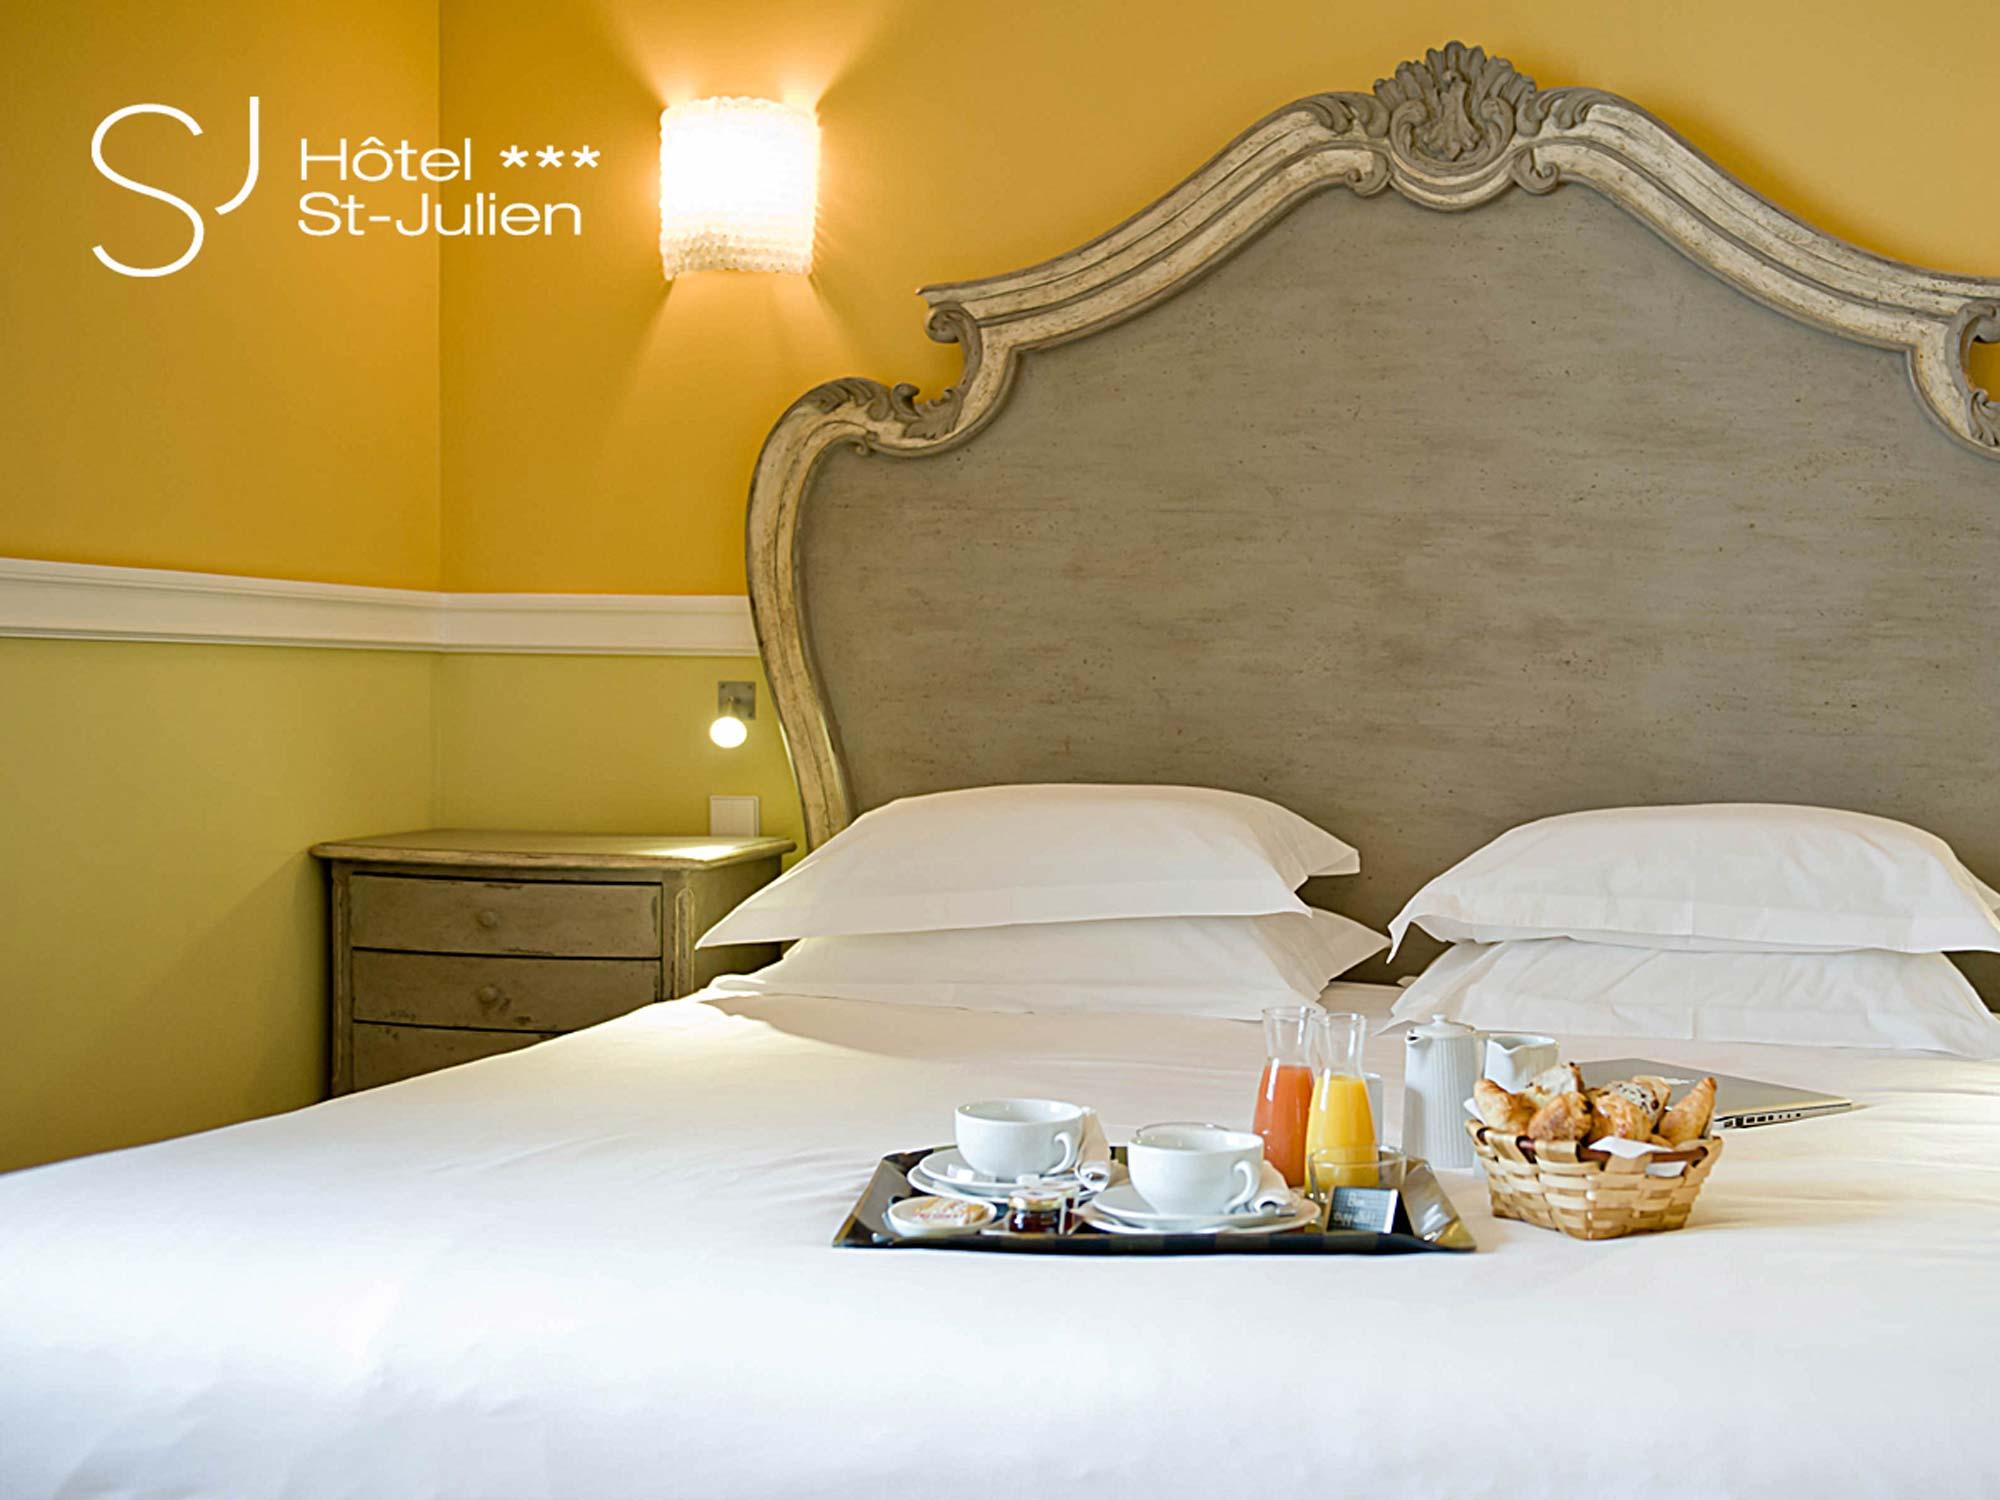 Chr Immobilier - Hotel Saint Julien *** Biarritz